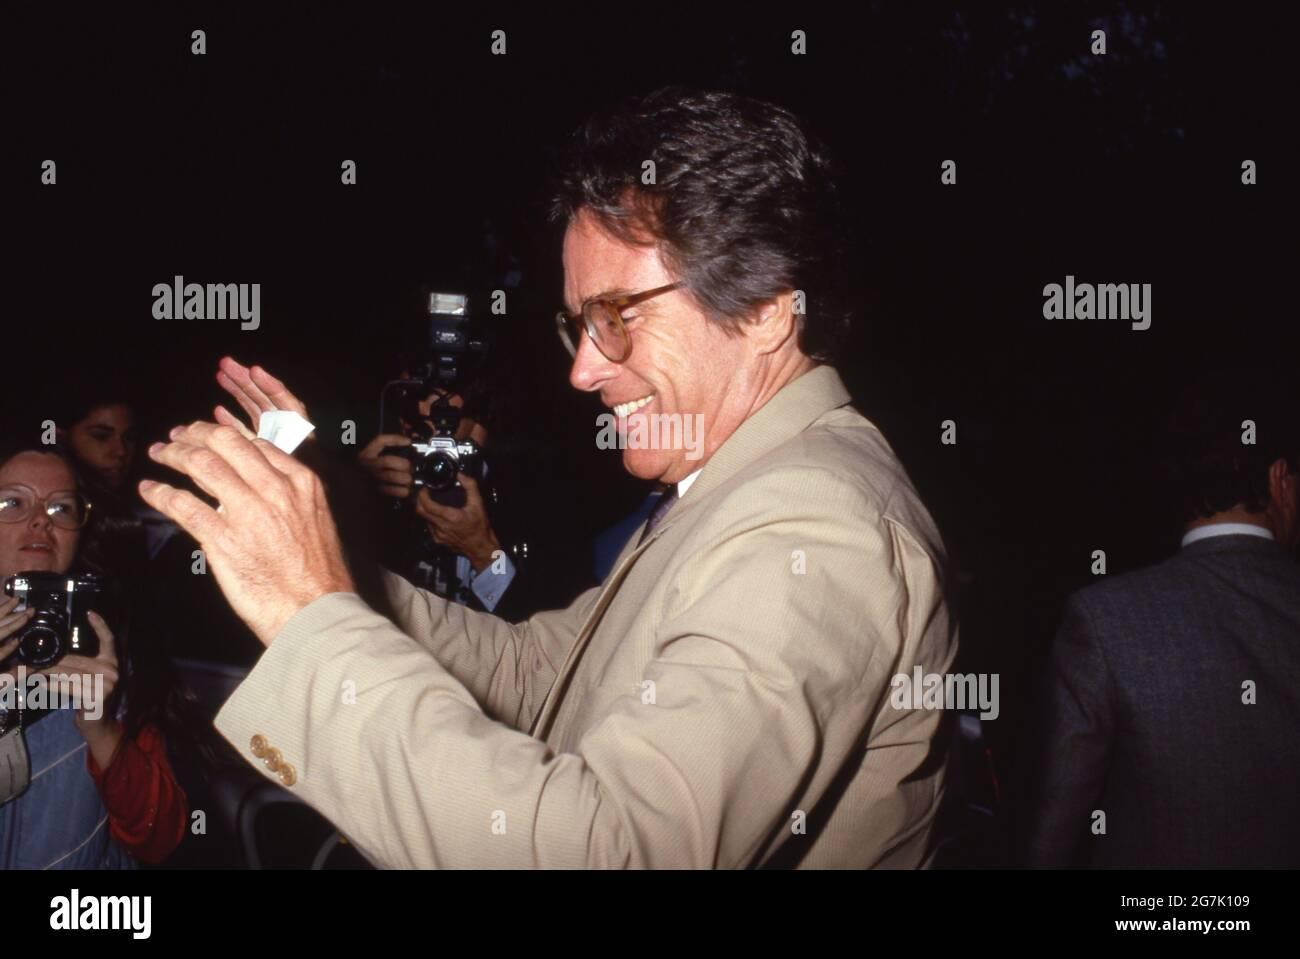 Warren Beatty Circa 1980's Crédito: Ralph Dominguez/MediaPunch Foto de stock